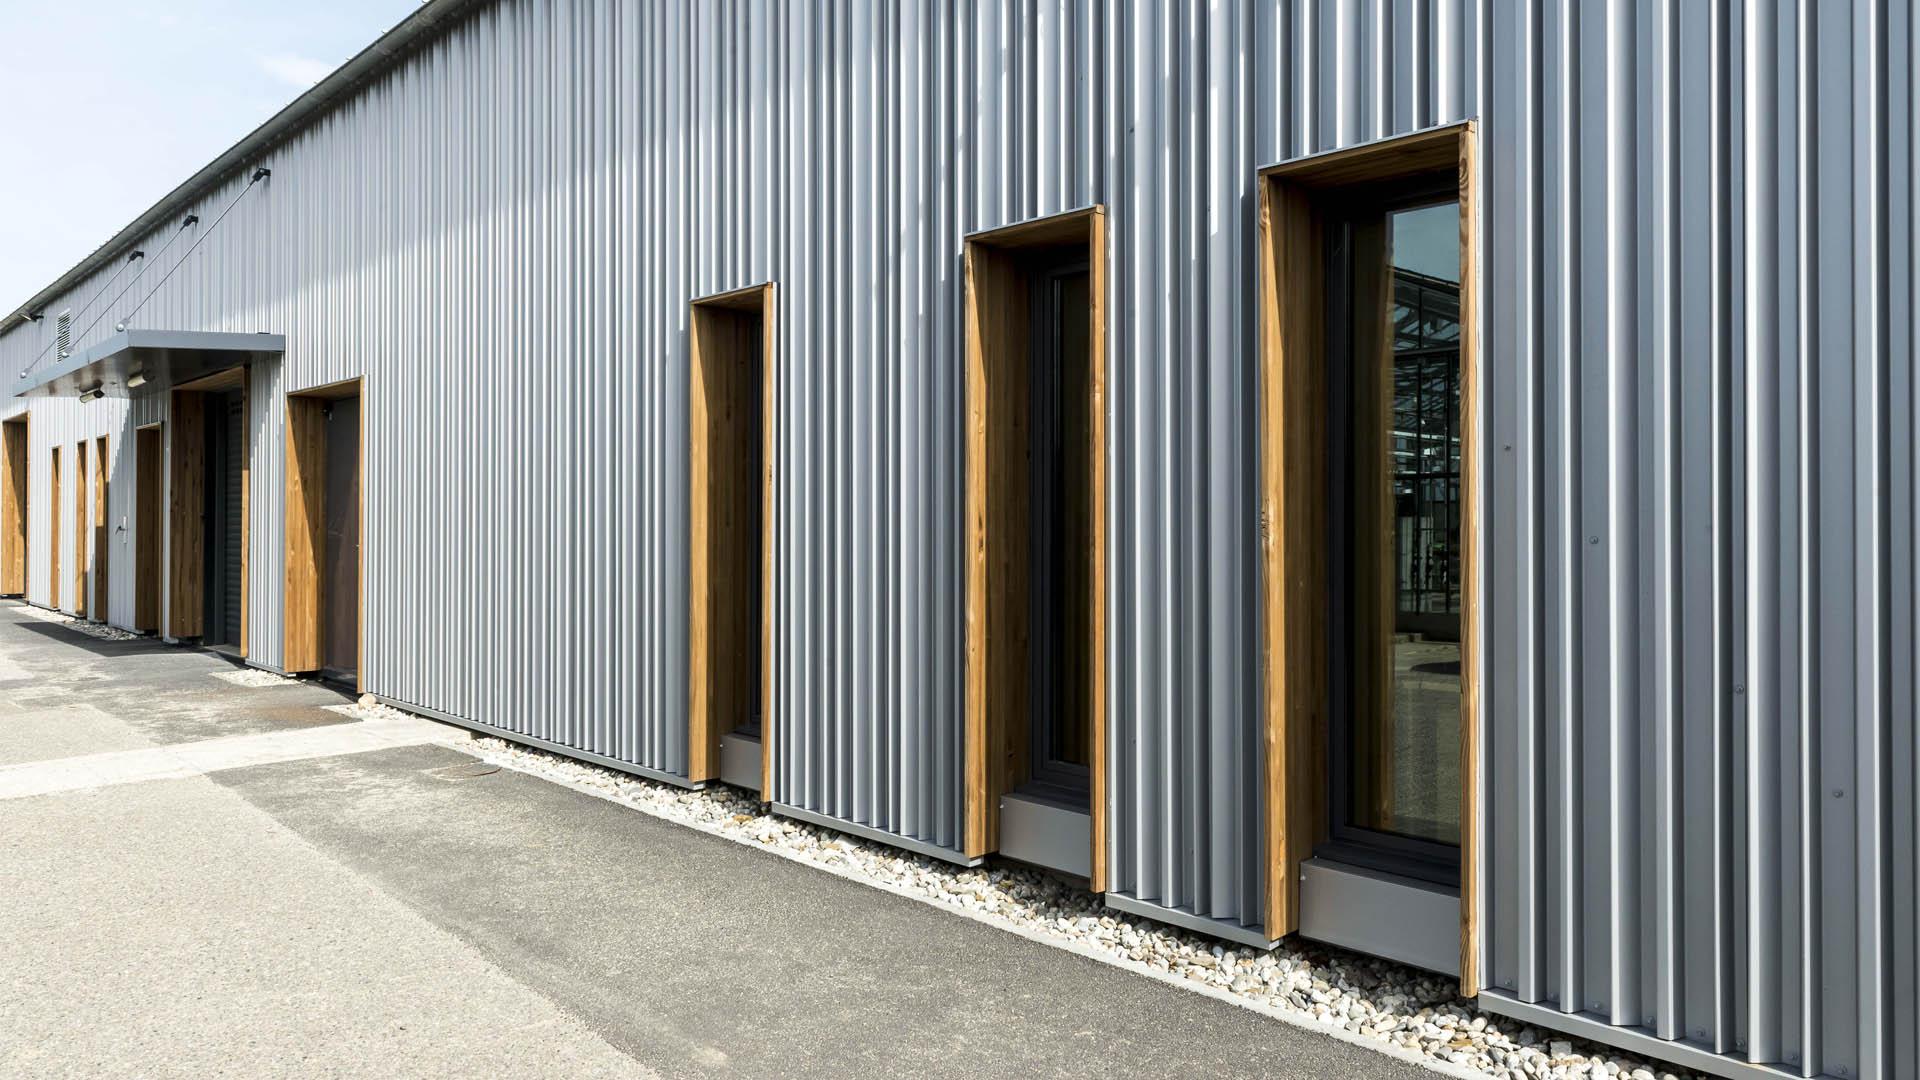 Seuil-architecture-Construction-Agro-écologie-03